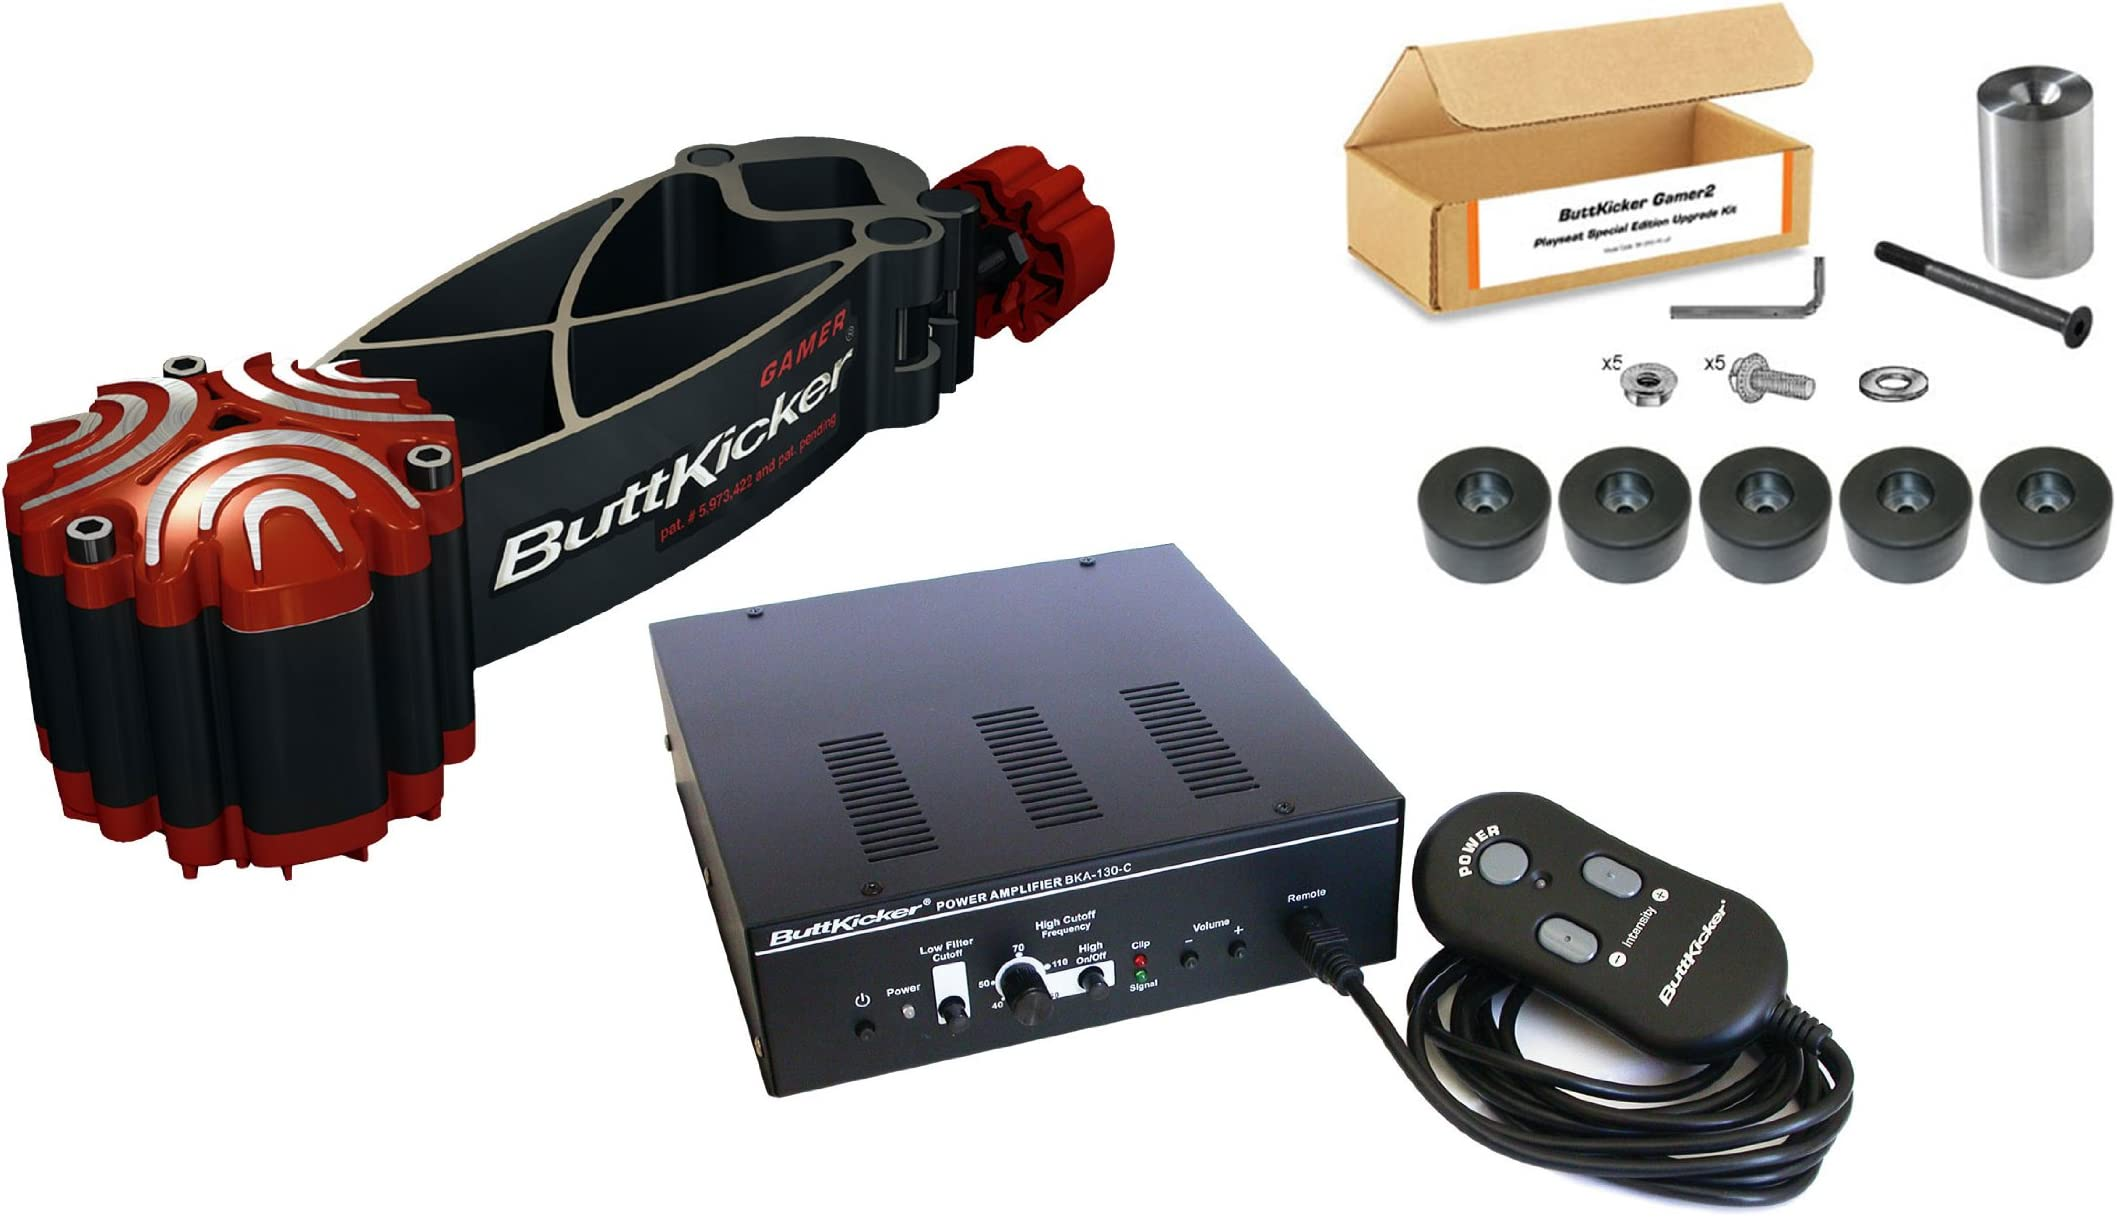 Fits Allen Screws Eazypower 35739 1-Pack 7//64-Inch Hex Key Isomax 9-Inch Screwdriver